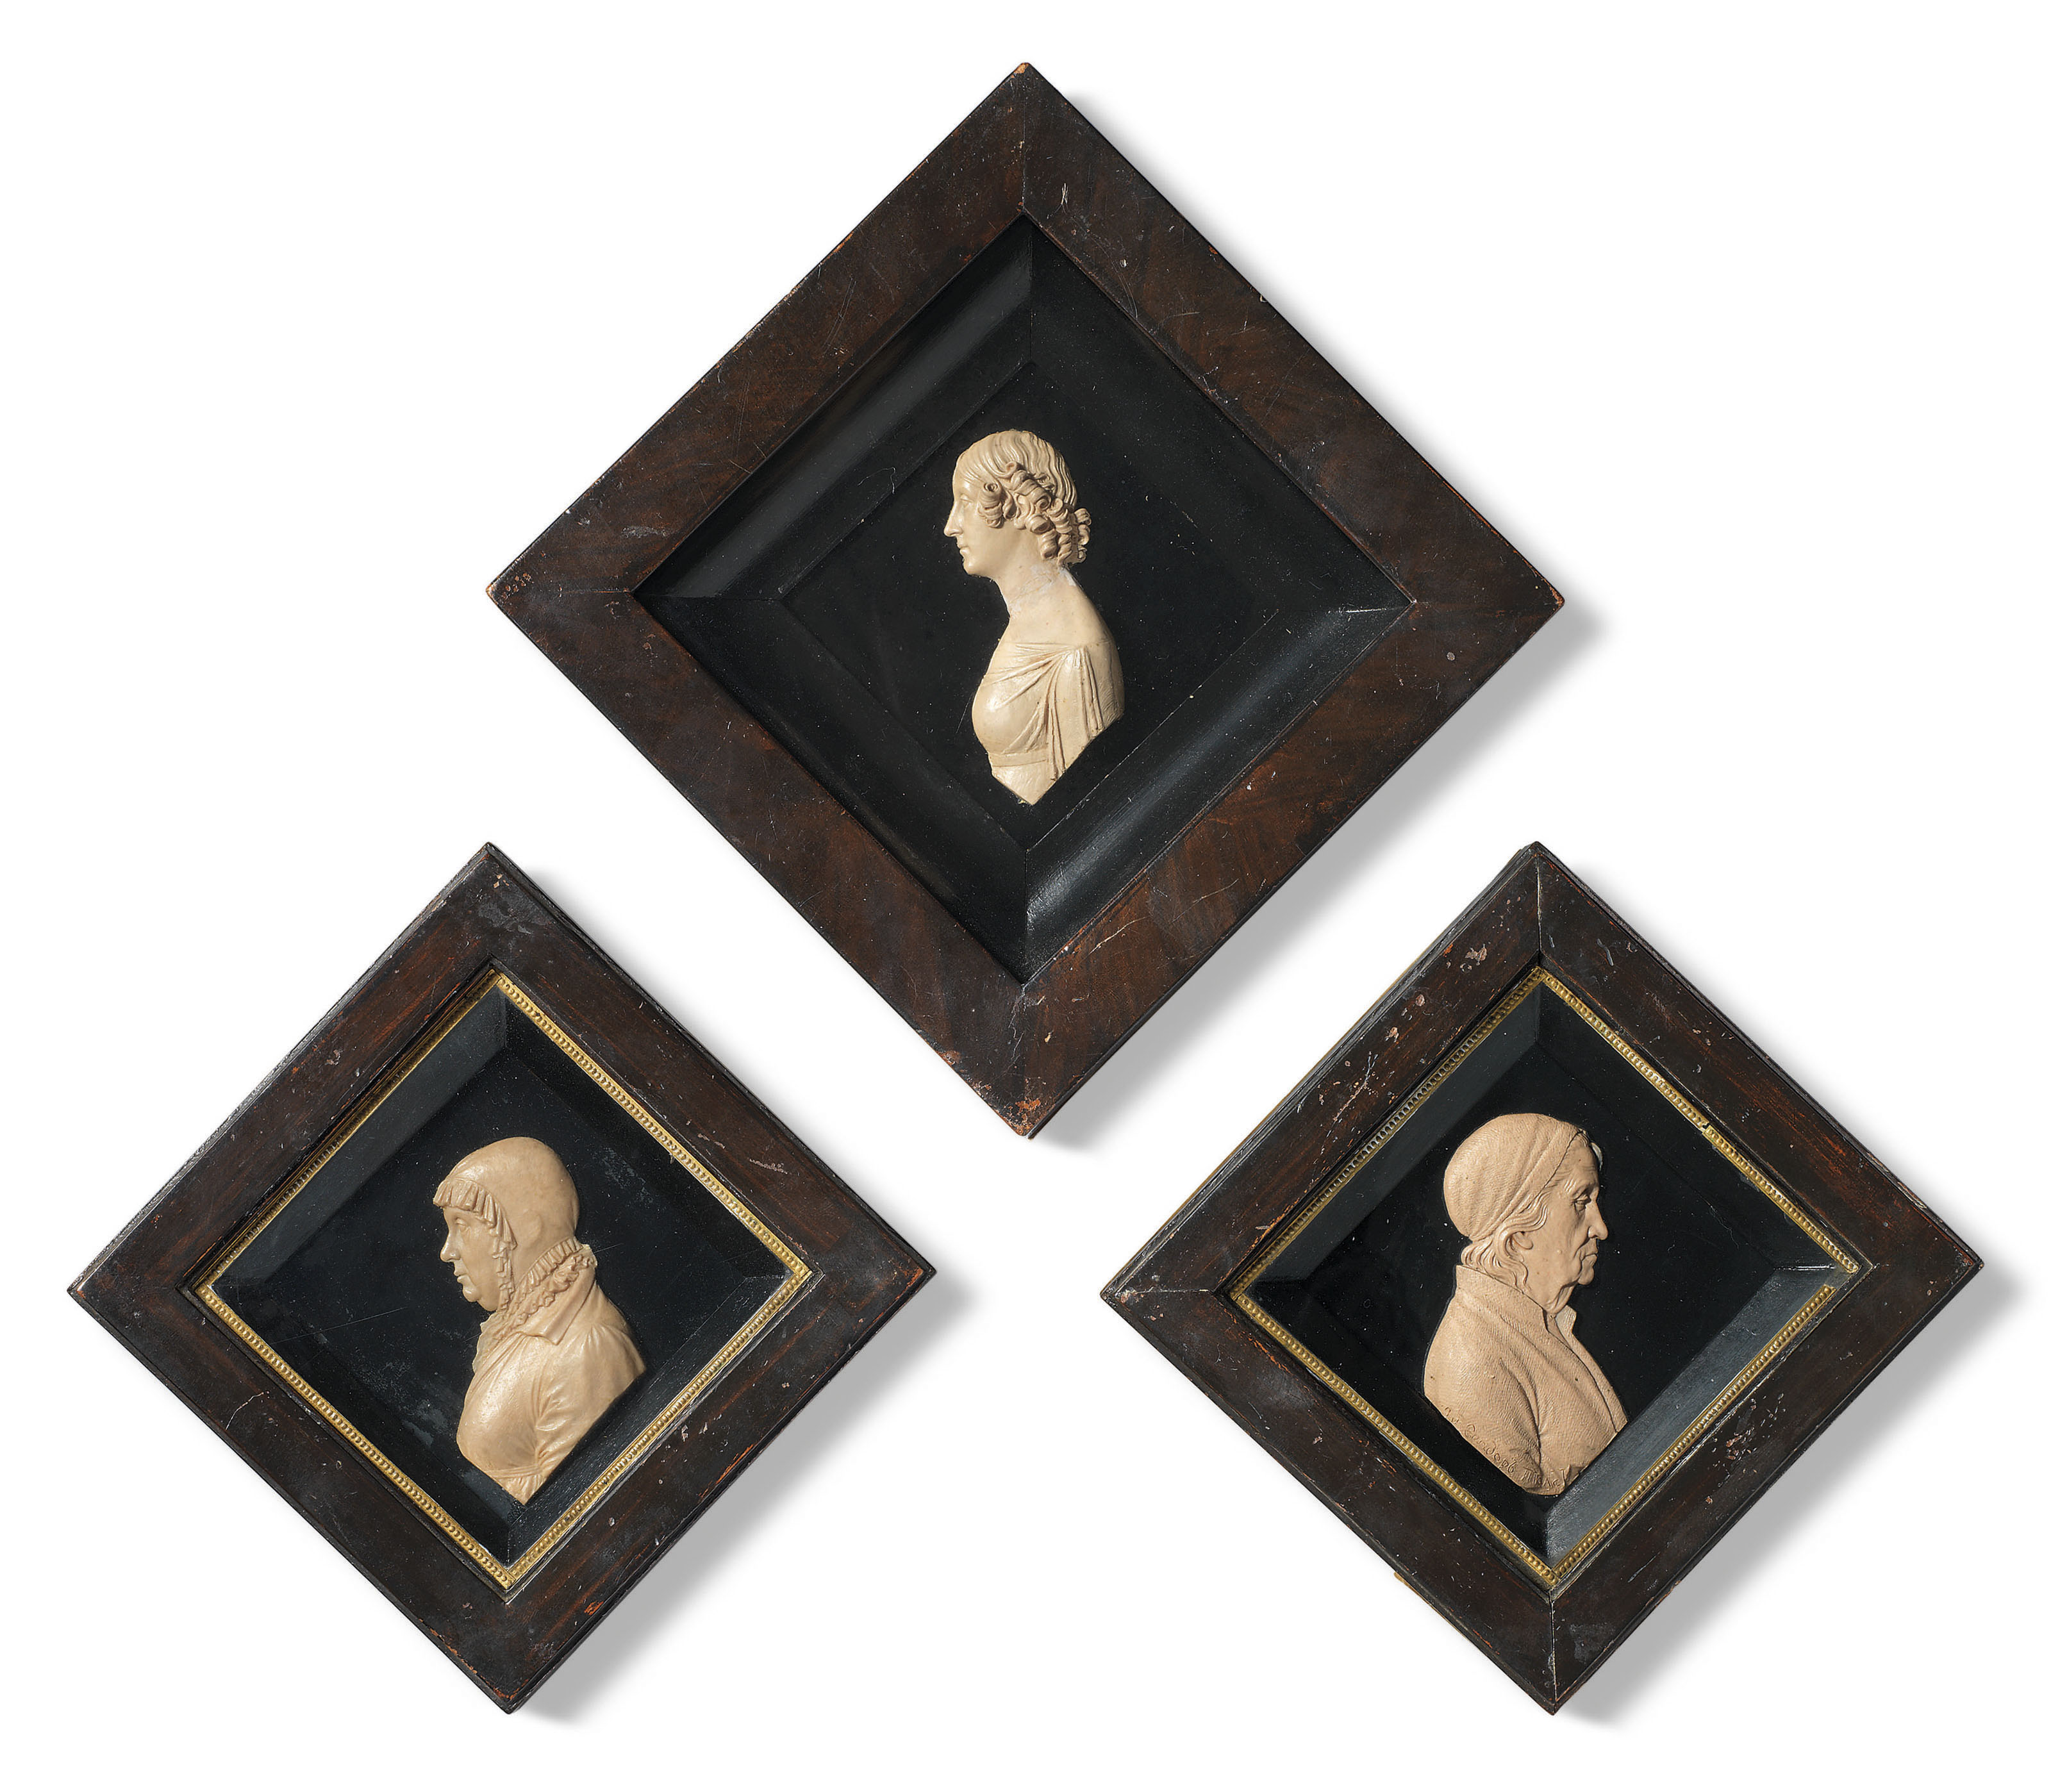 THREE RARE WAX PORTRAIT RELIEFS